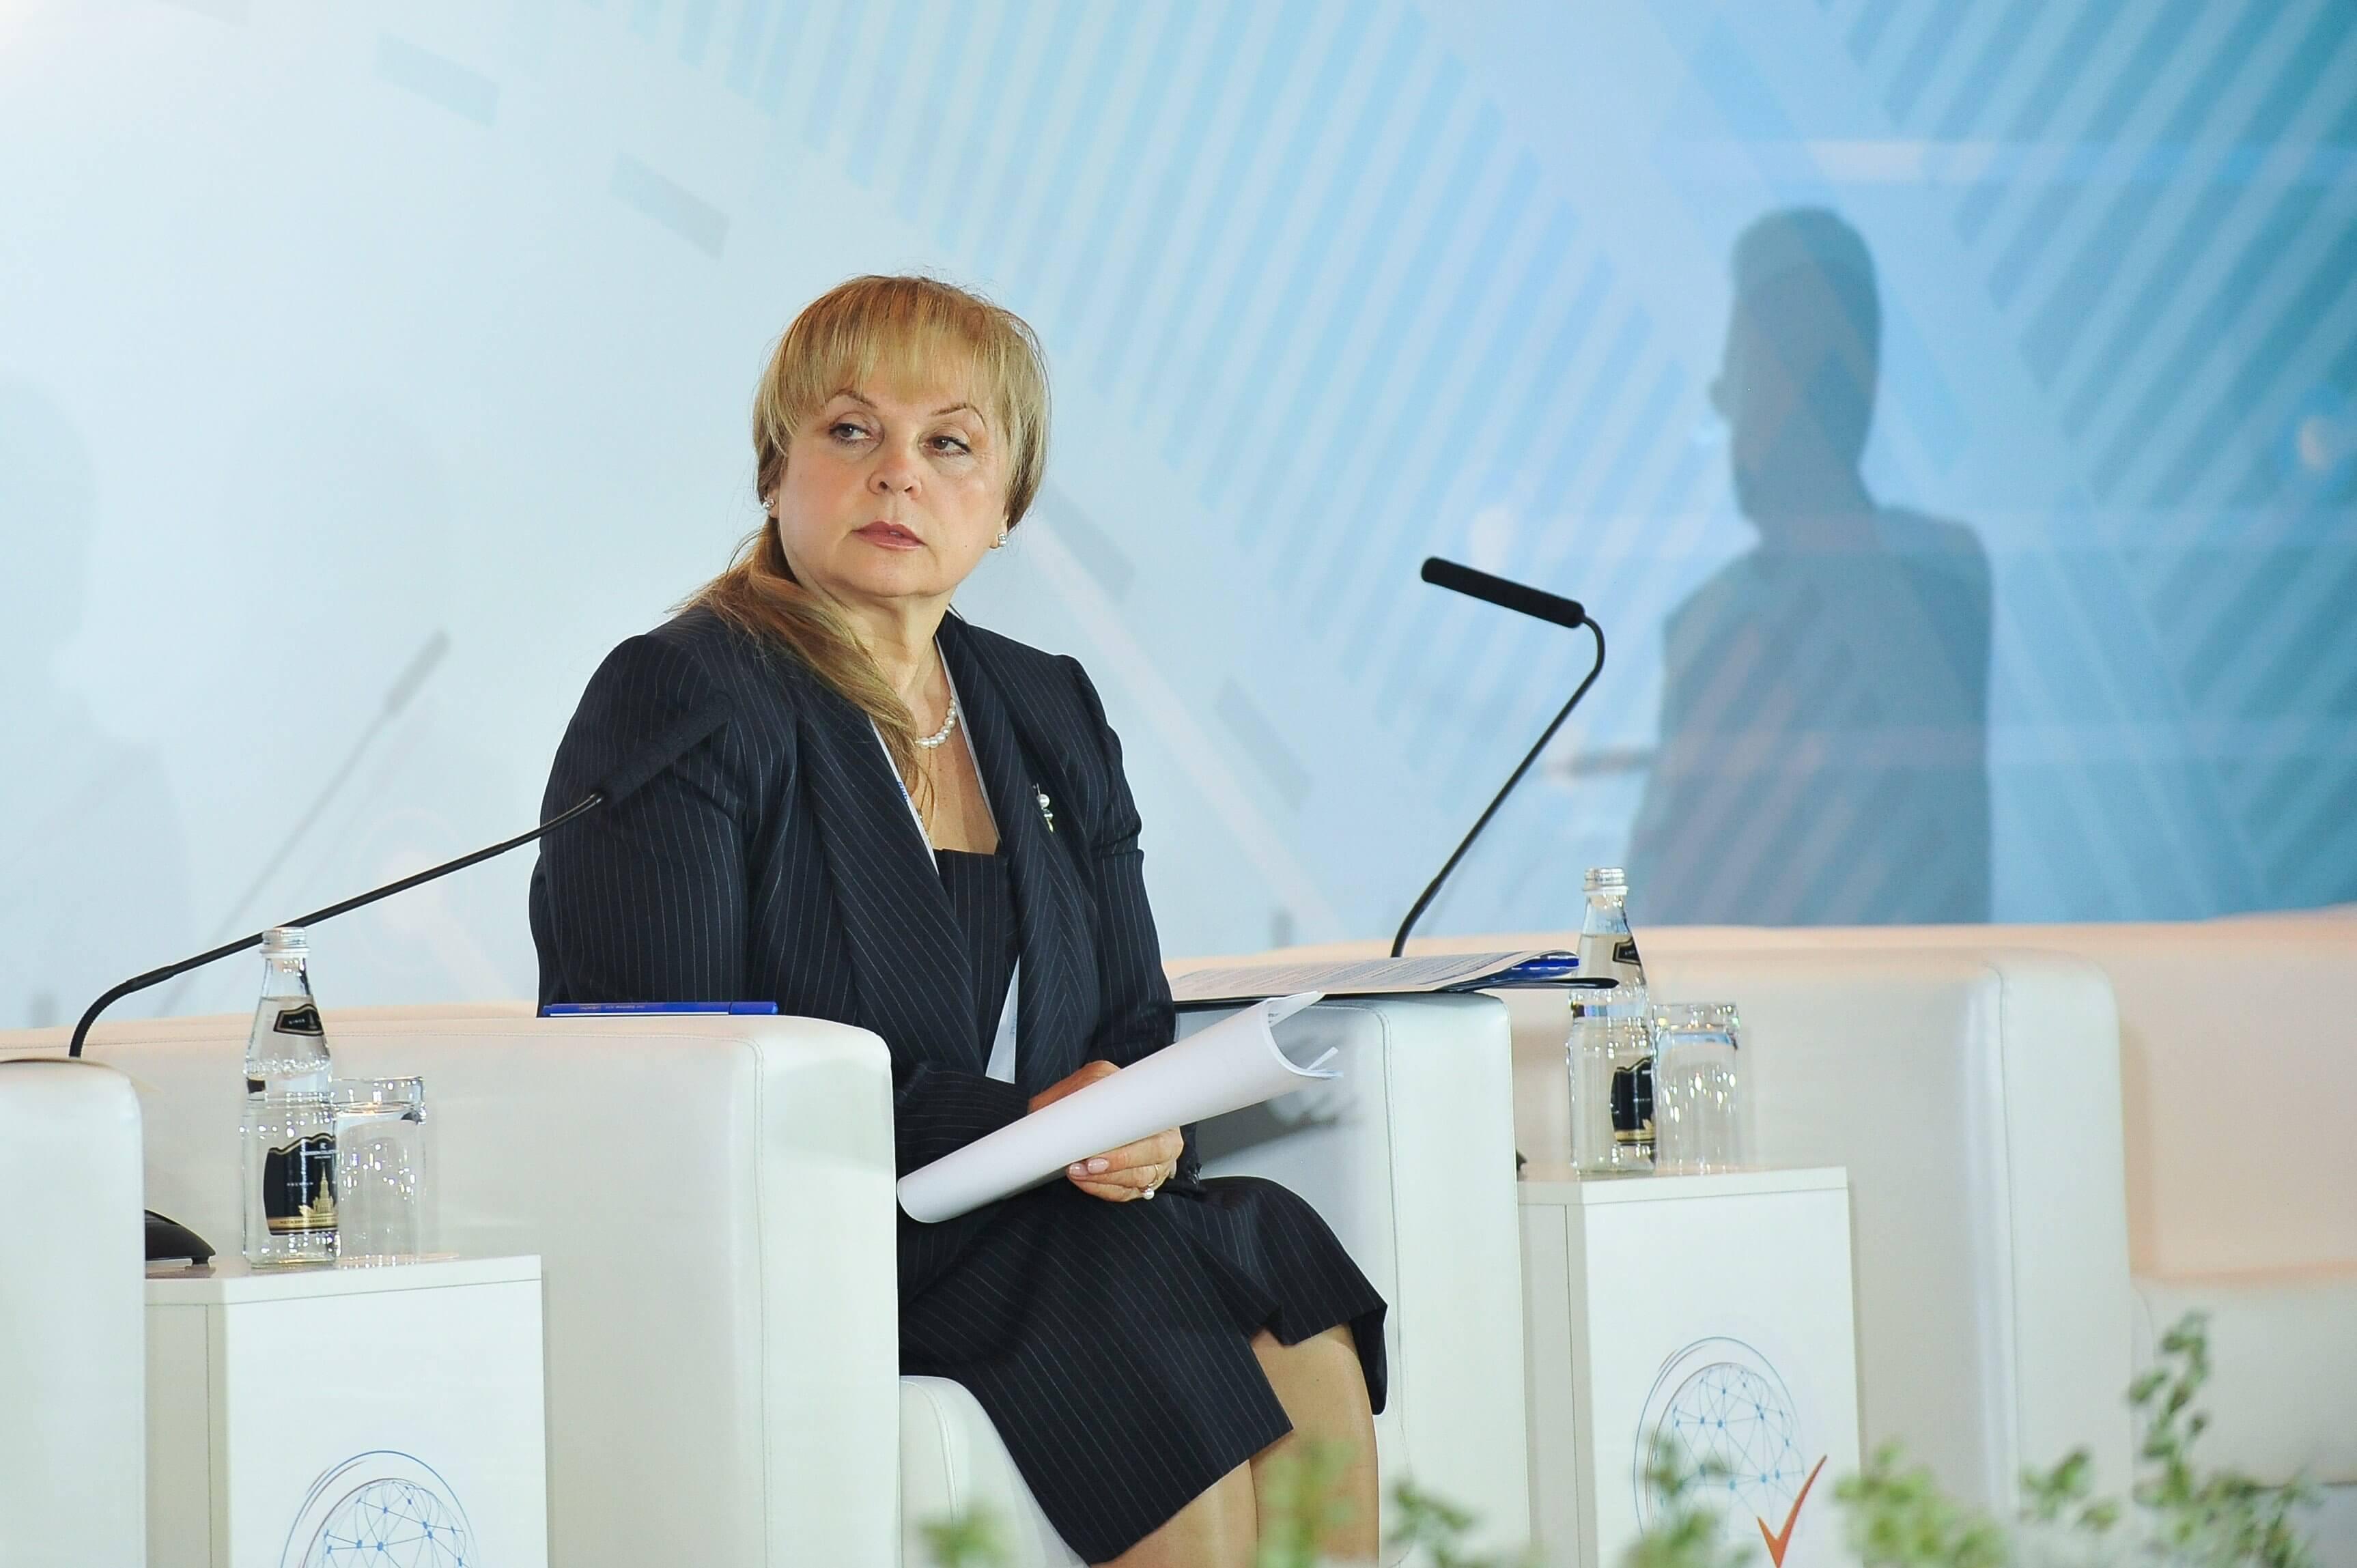 АГН Москва/Global Look Press